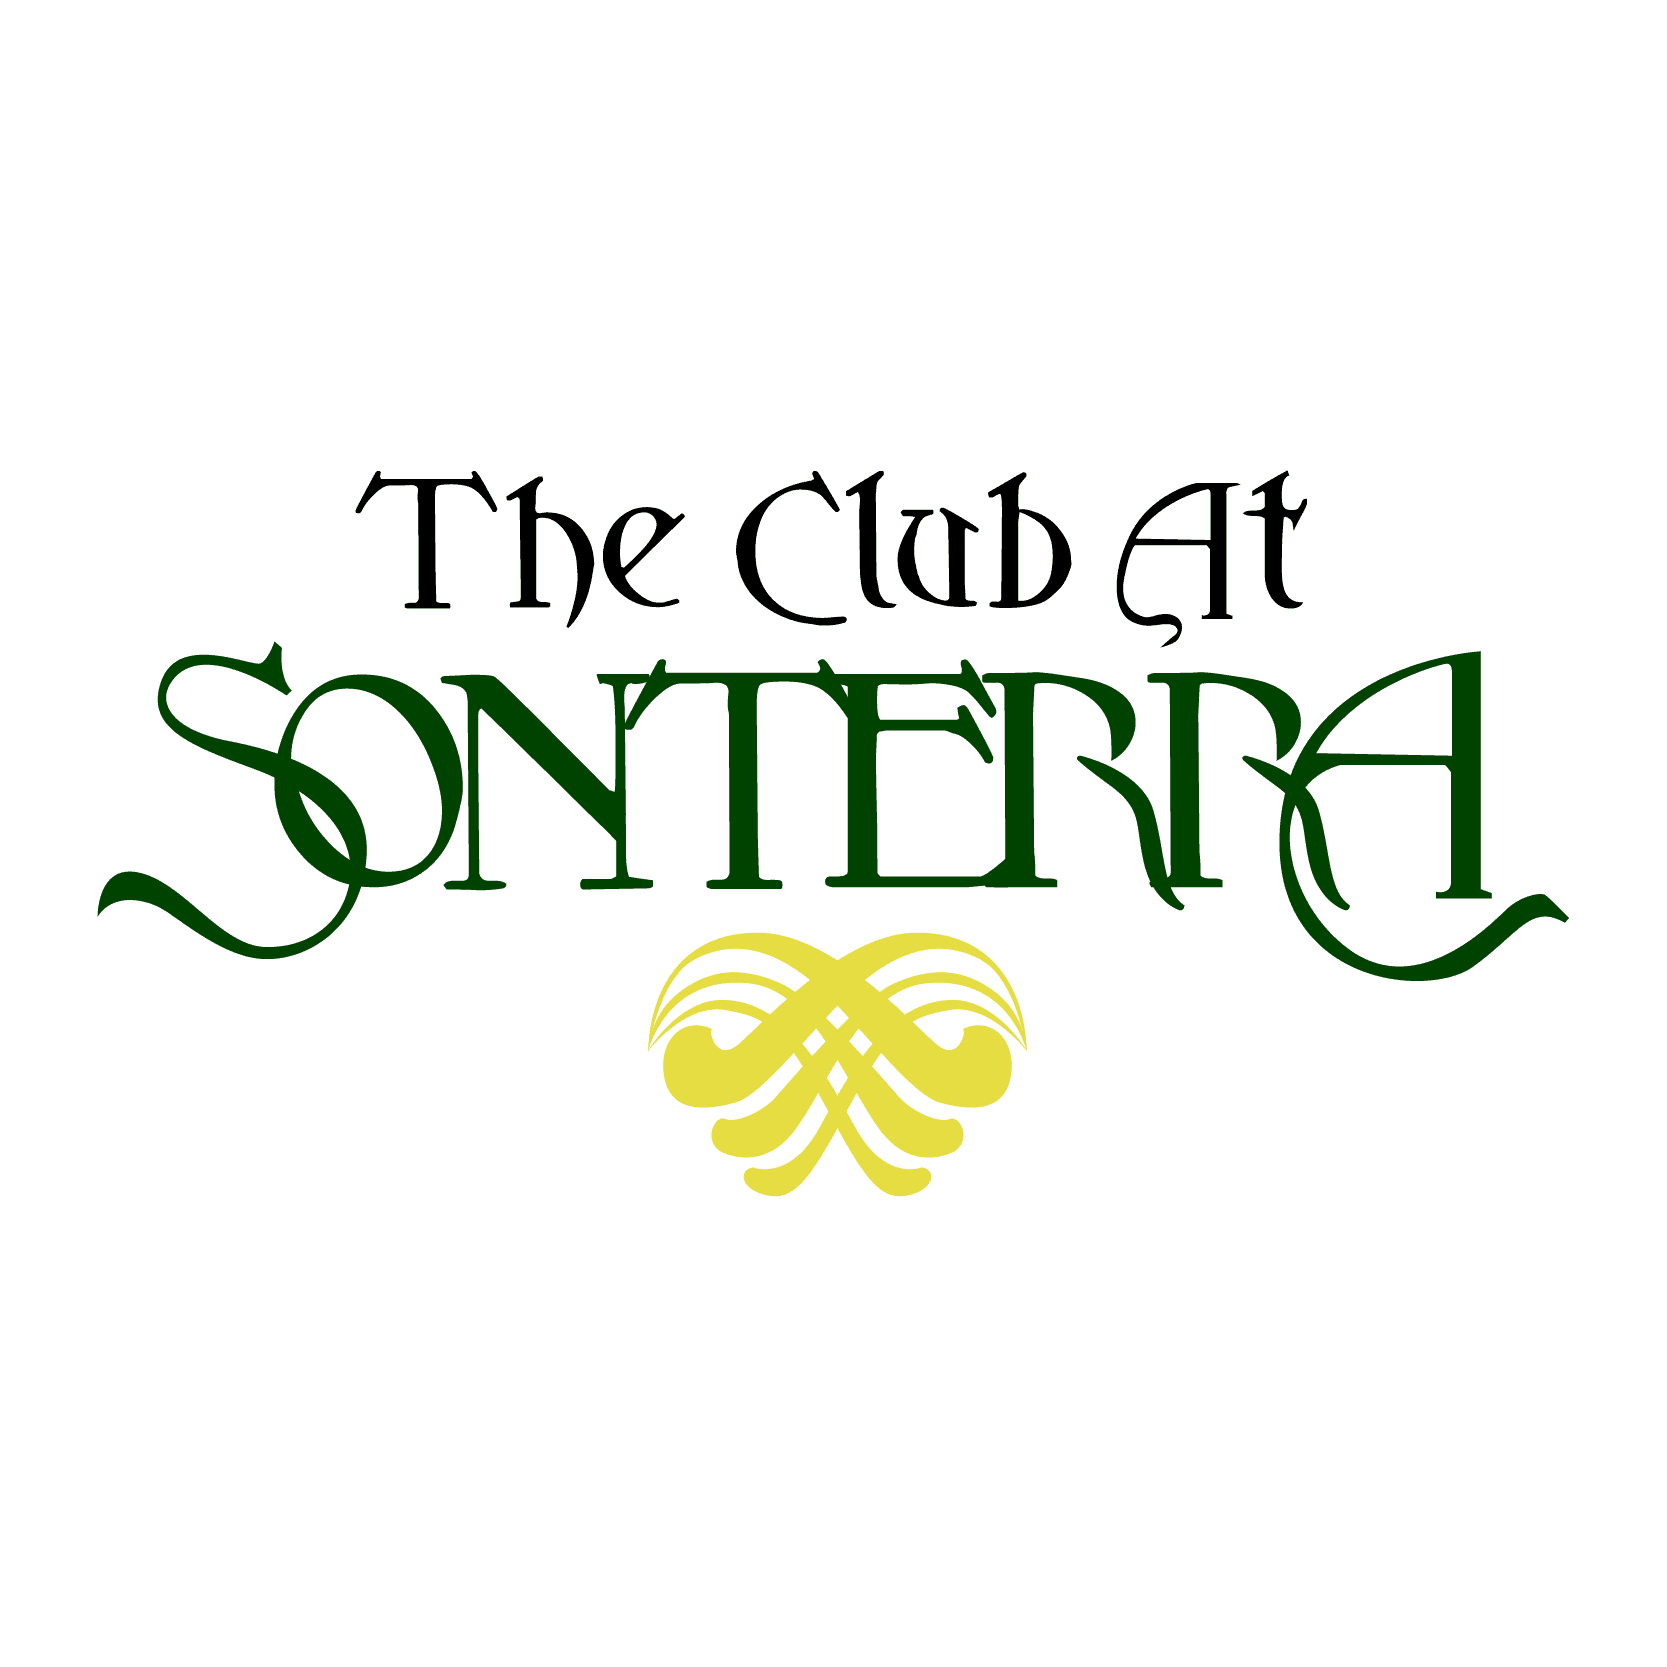 The Club At Sonterra logo